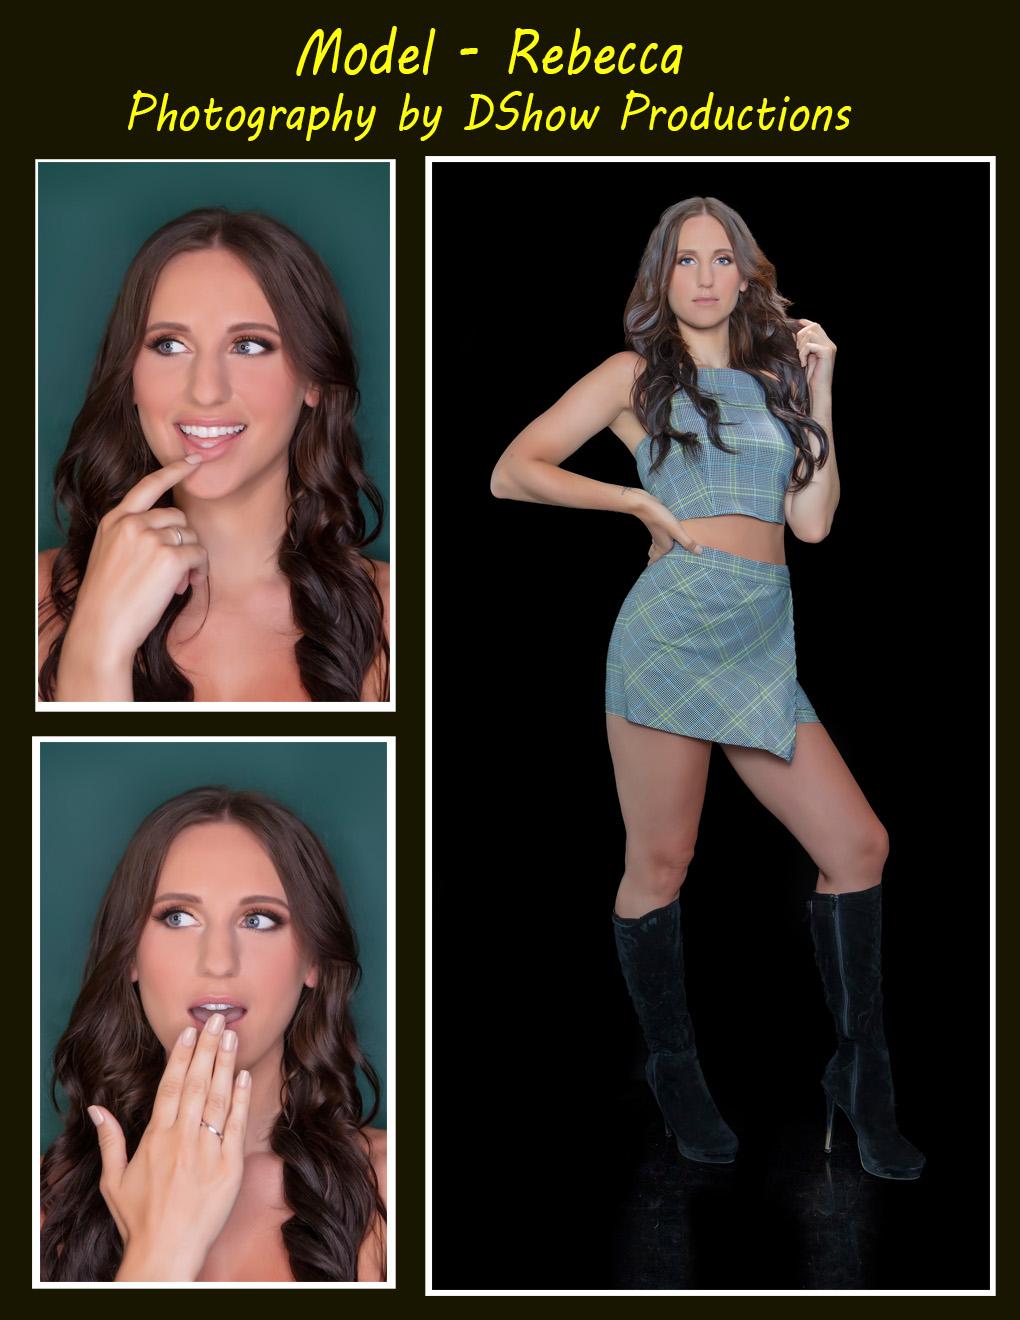 Model Rebecca